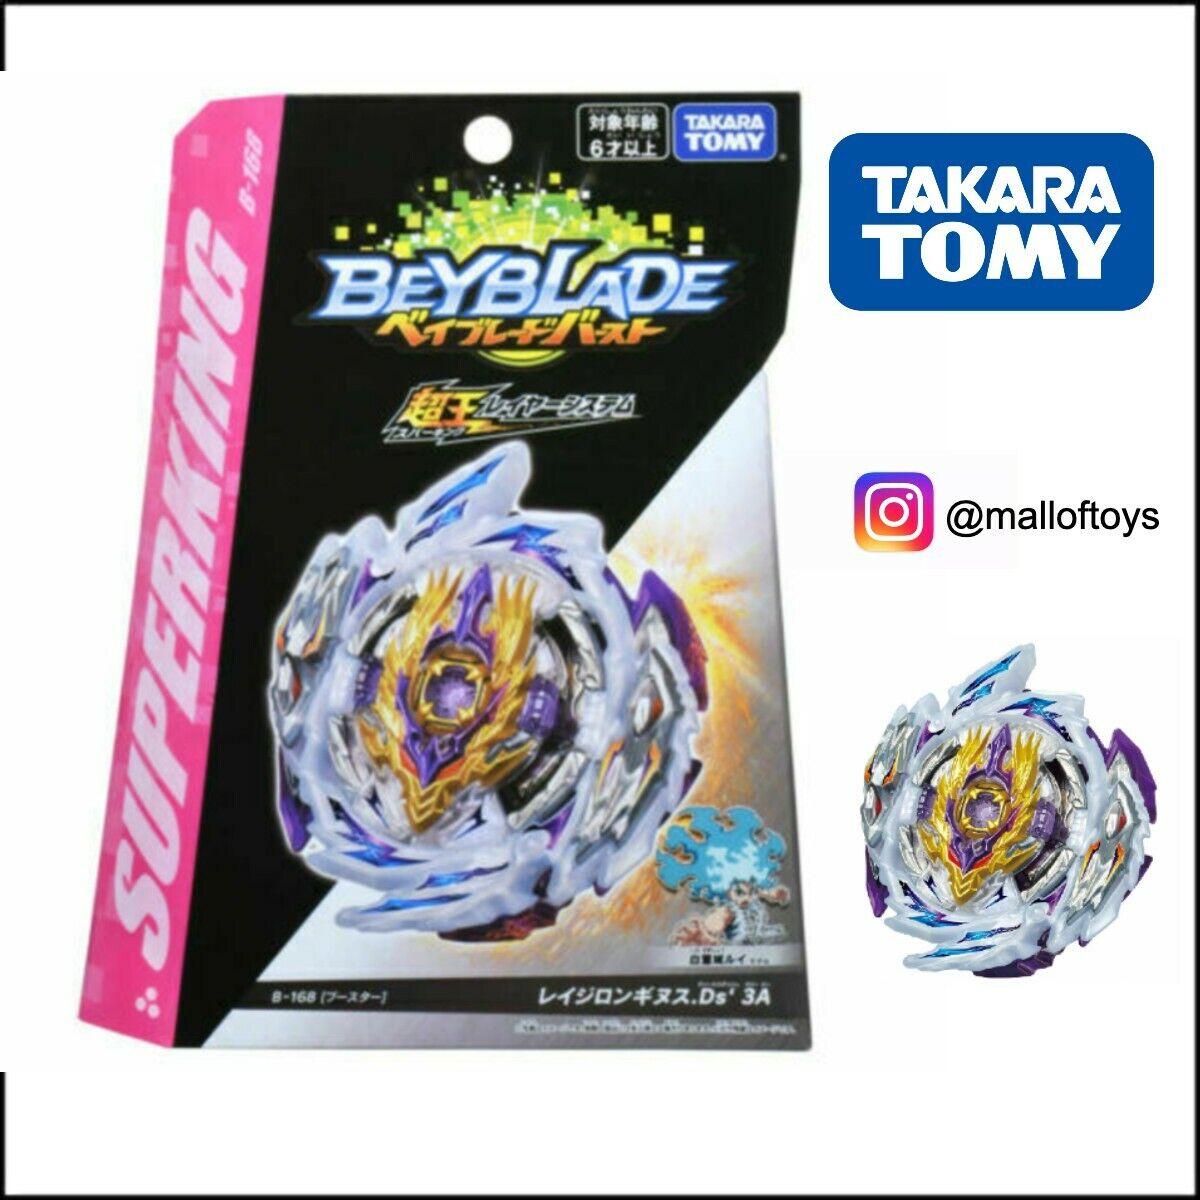 как выглядит Takara Tomy Beyblade Burst B-168 Booster Rage Longinus .Ds 3A фото